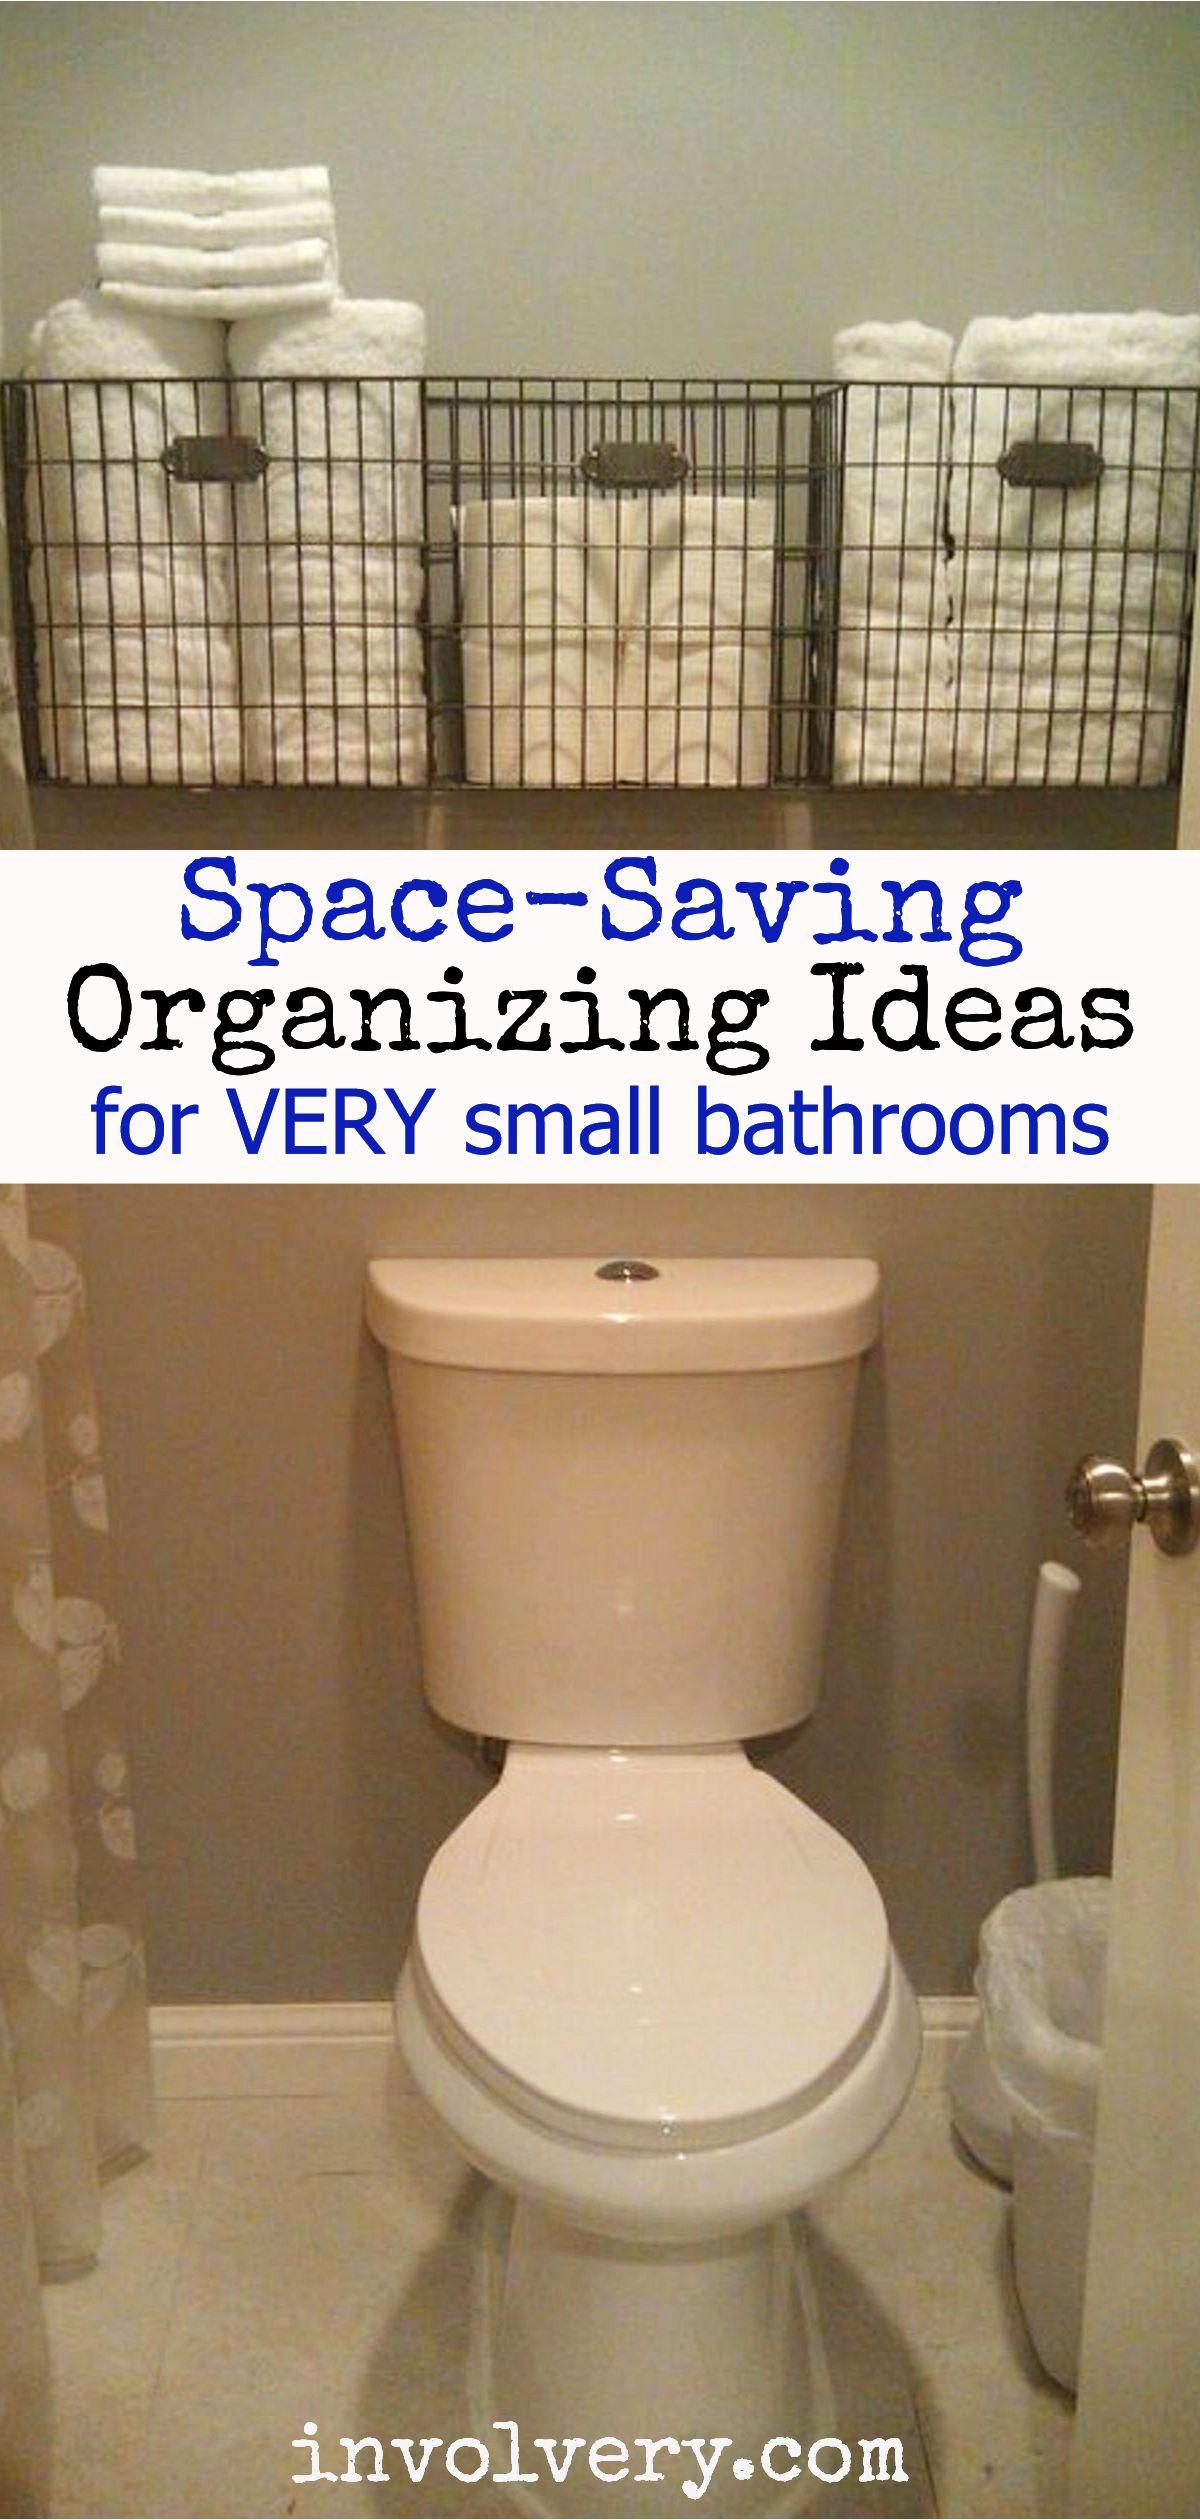 Creative Bathroom Storage Solutions For Small Bathrooms And Organization Ideas We Love Very Small Bathroom Space Saving Bathroom Small Bathroom Organization